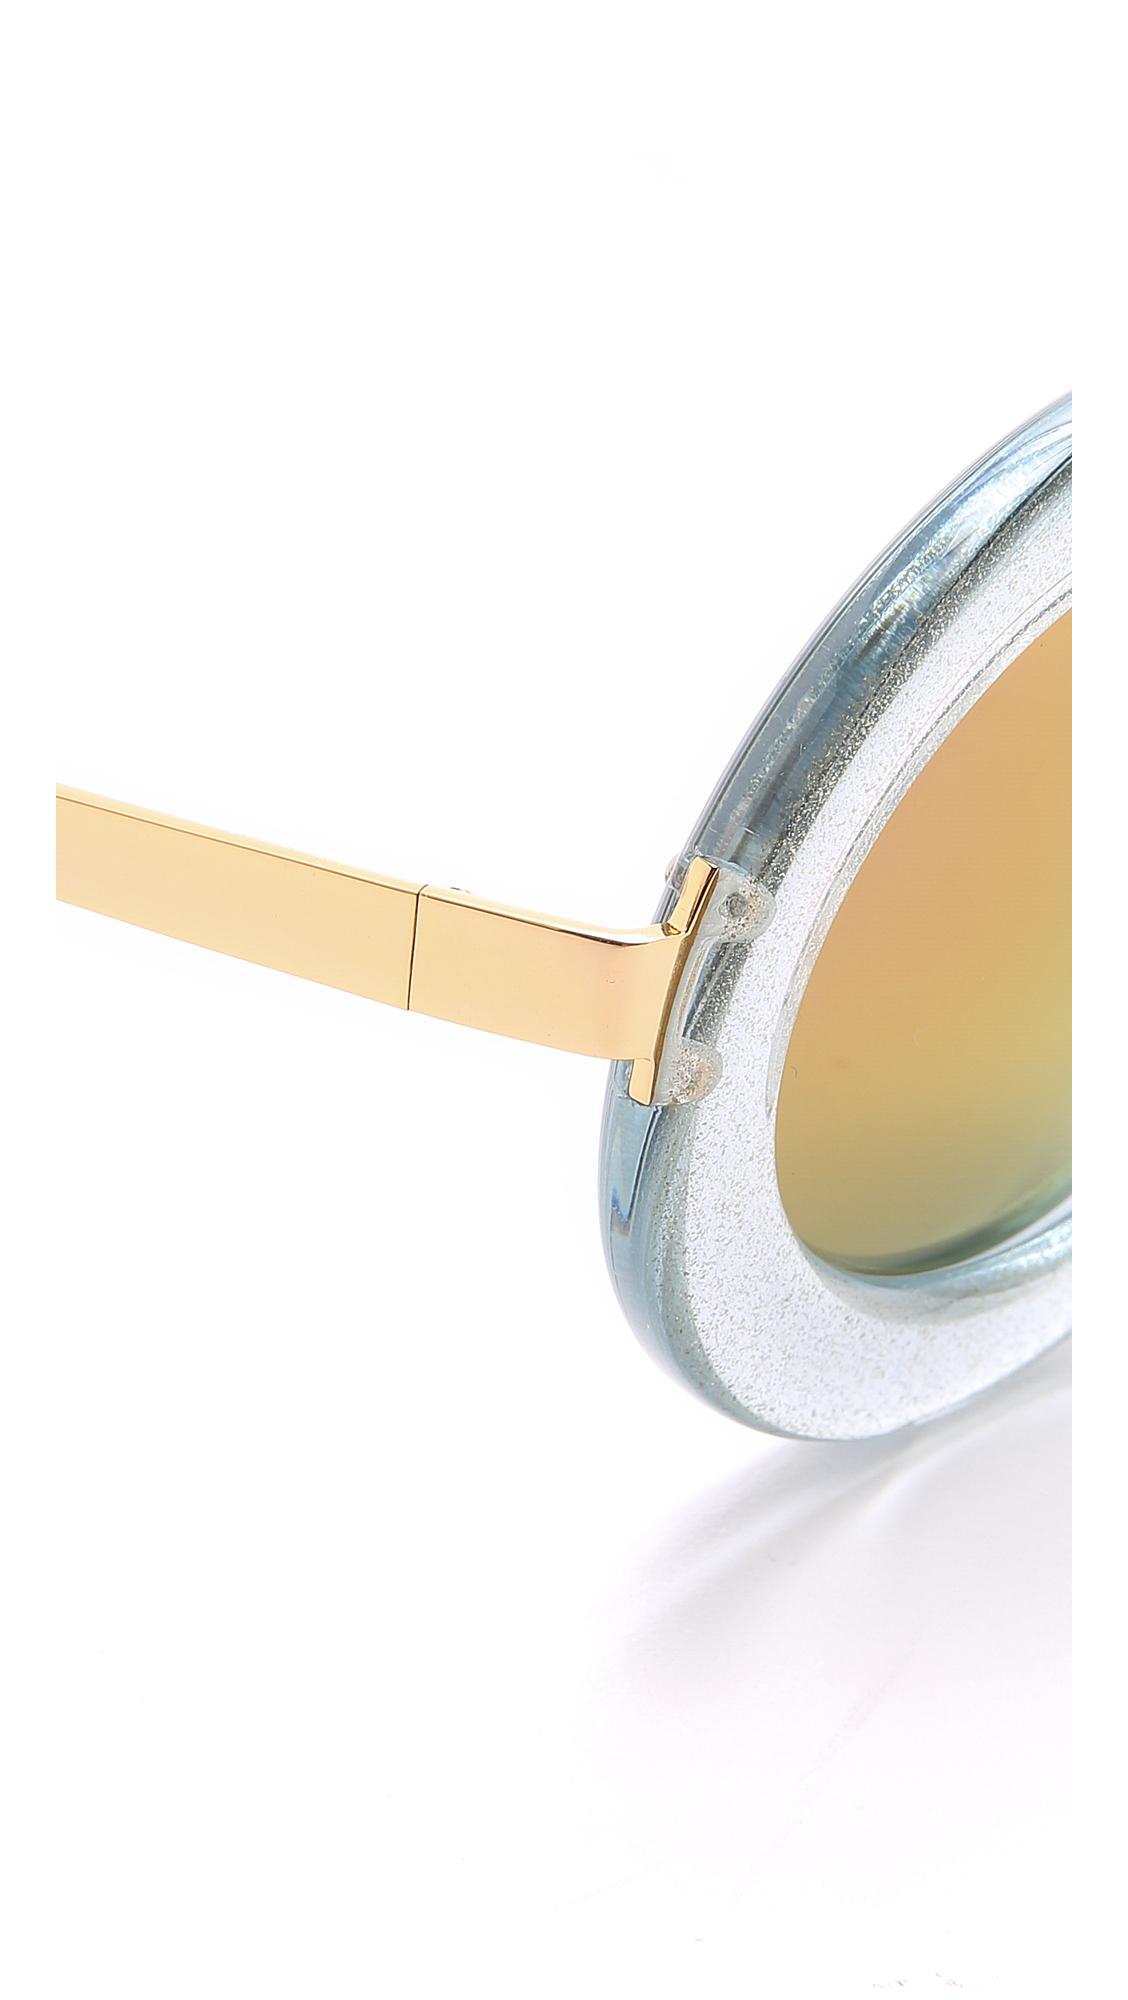 Markus Lupfer Round Revo Sunglasses - Blue/pink in White